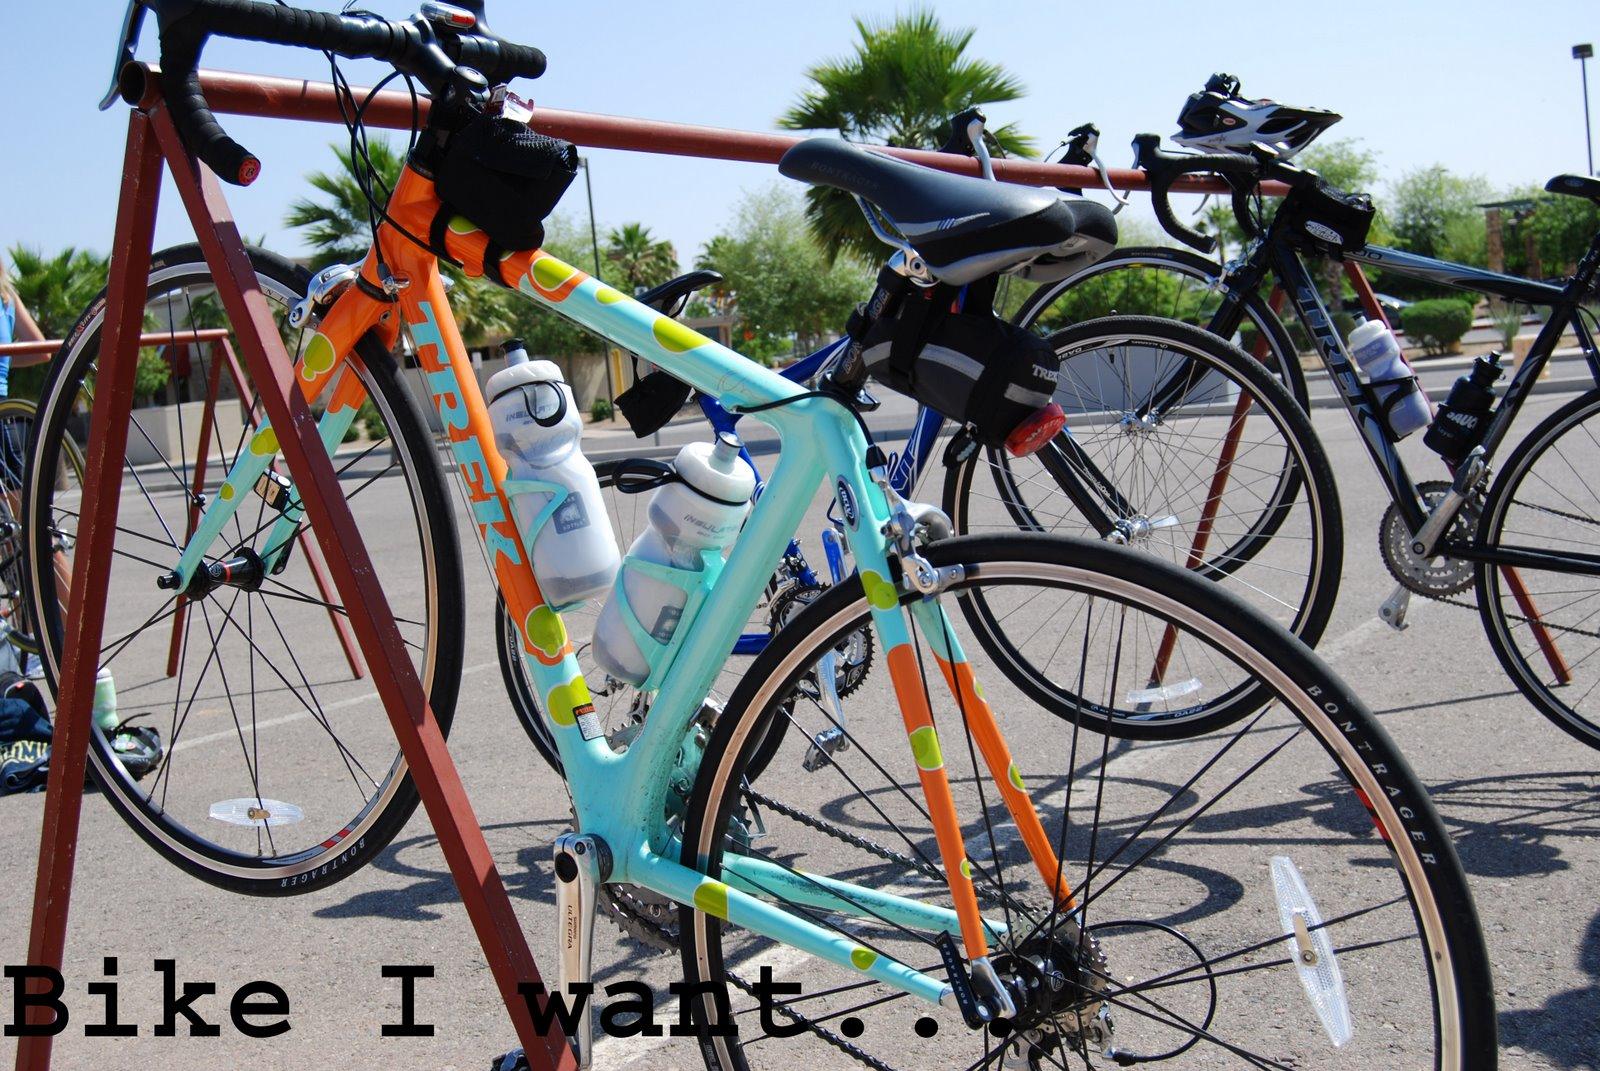 [polkadotbike.jpg]